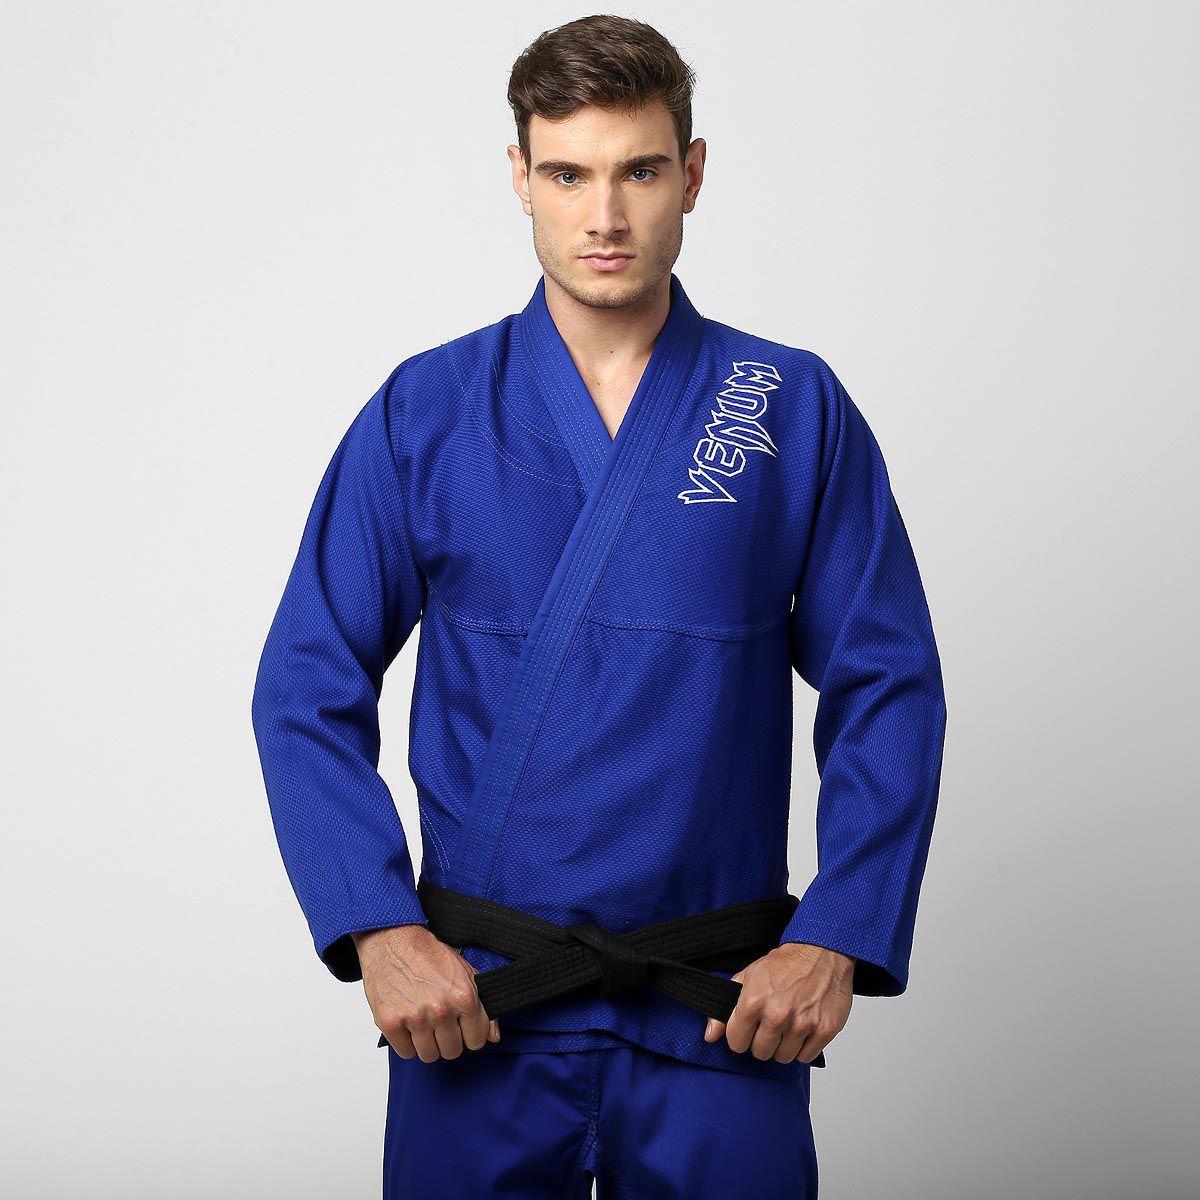 Kimono Jiu Jitsu Contender BJJ - Trancado - Venum - Azul -